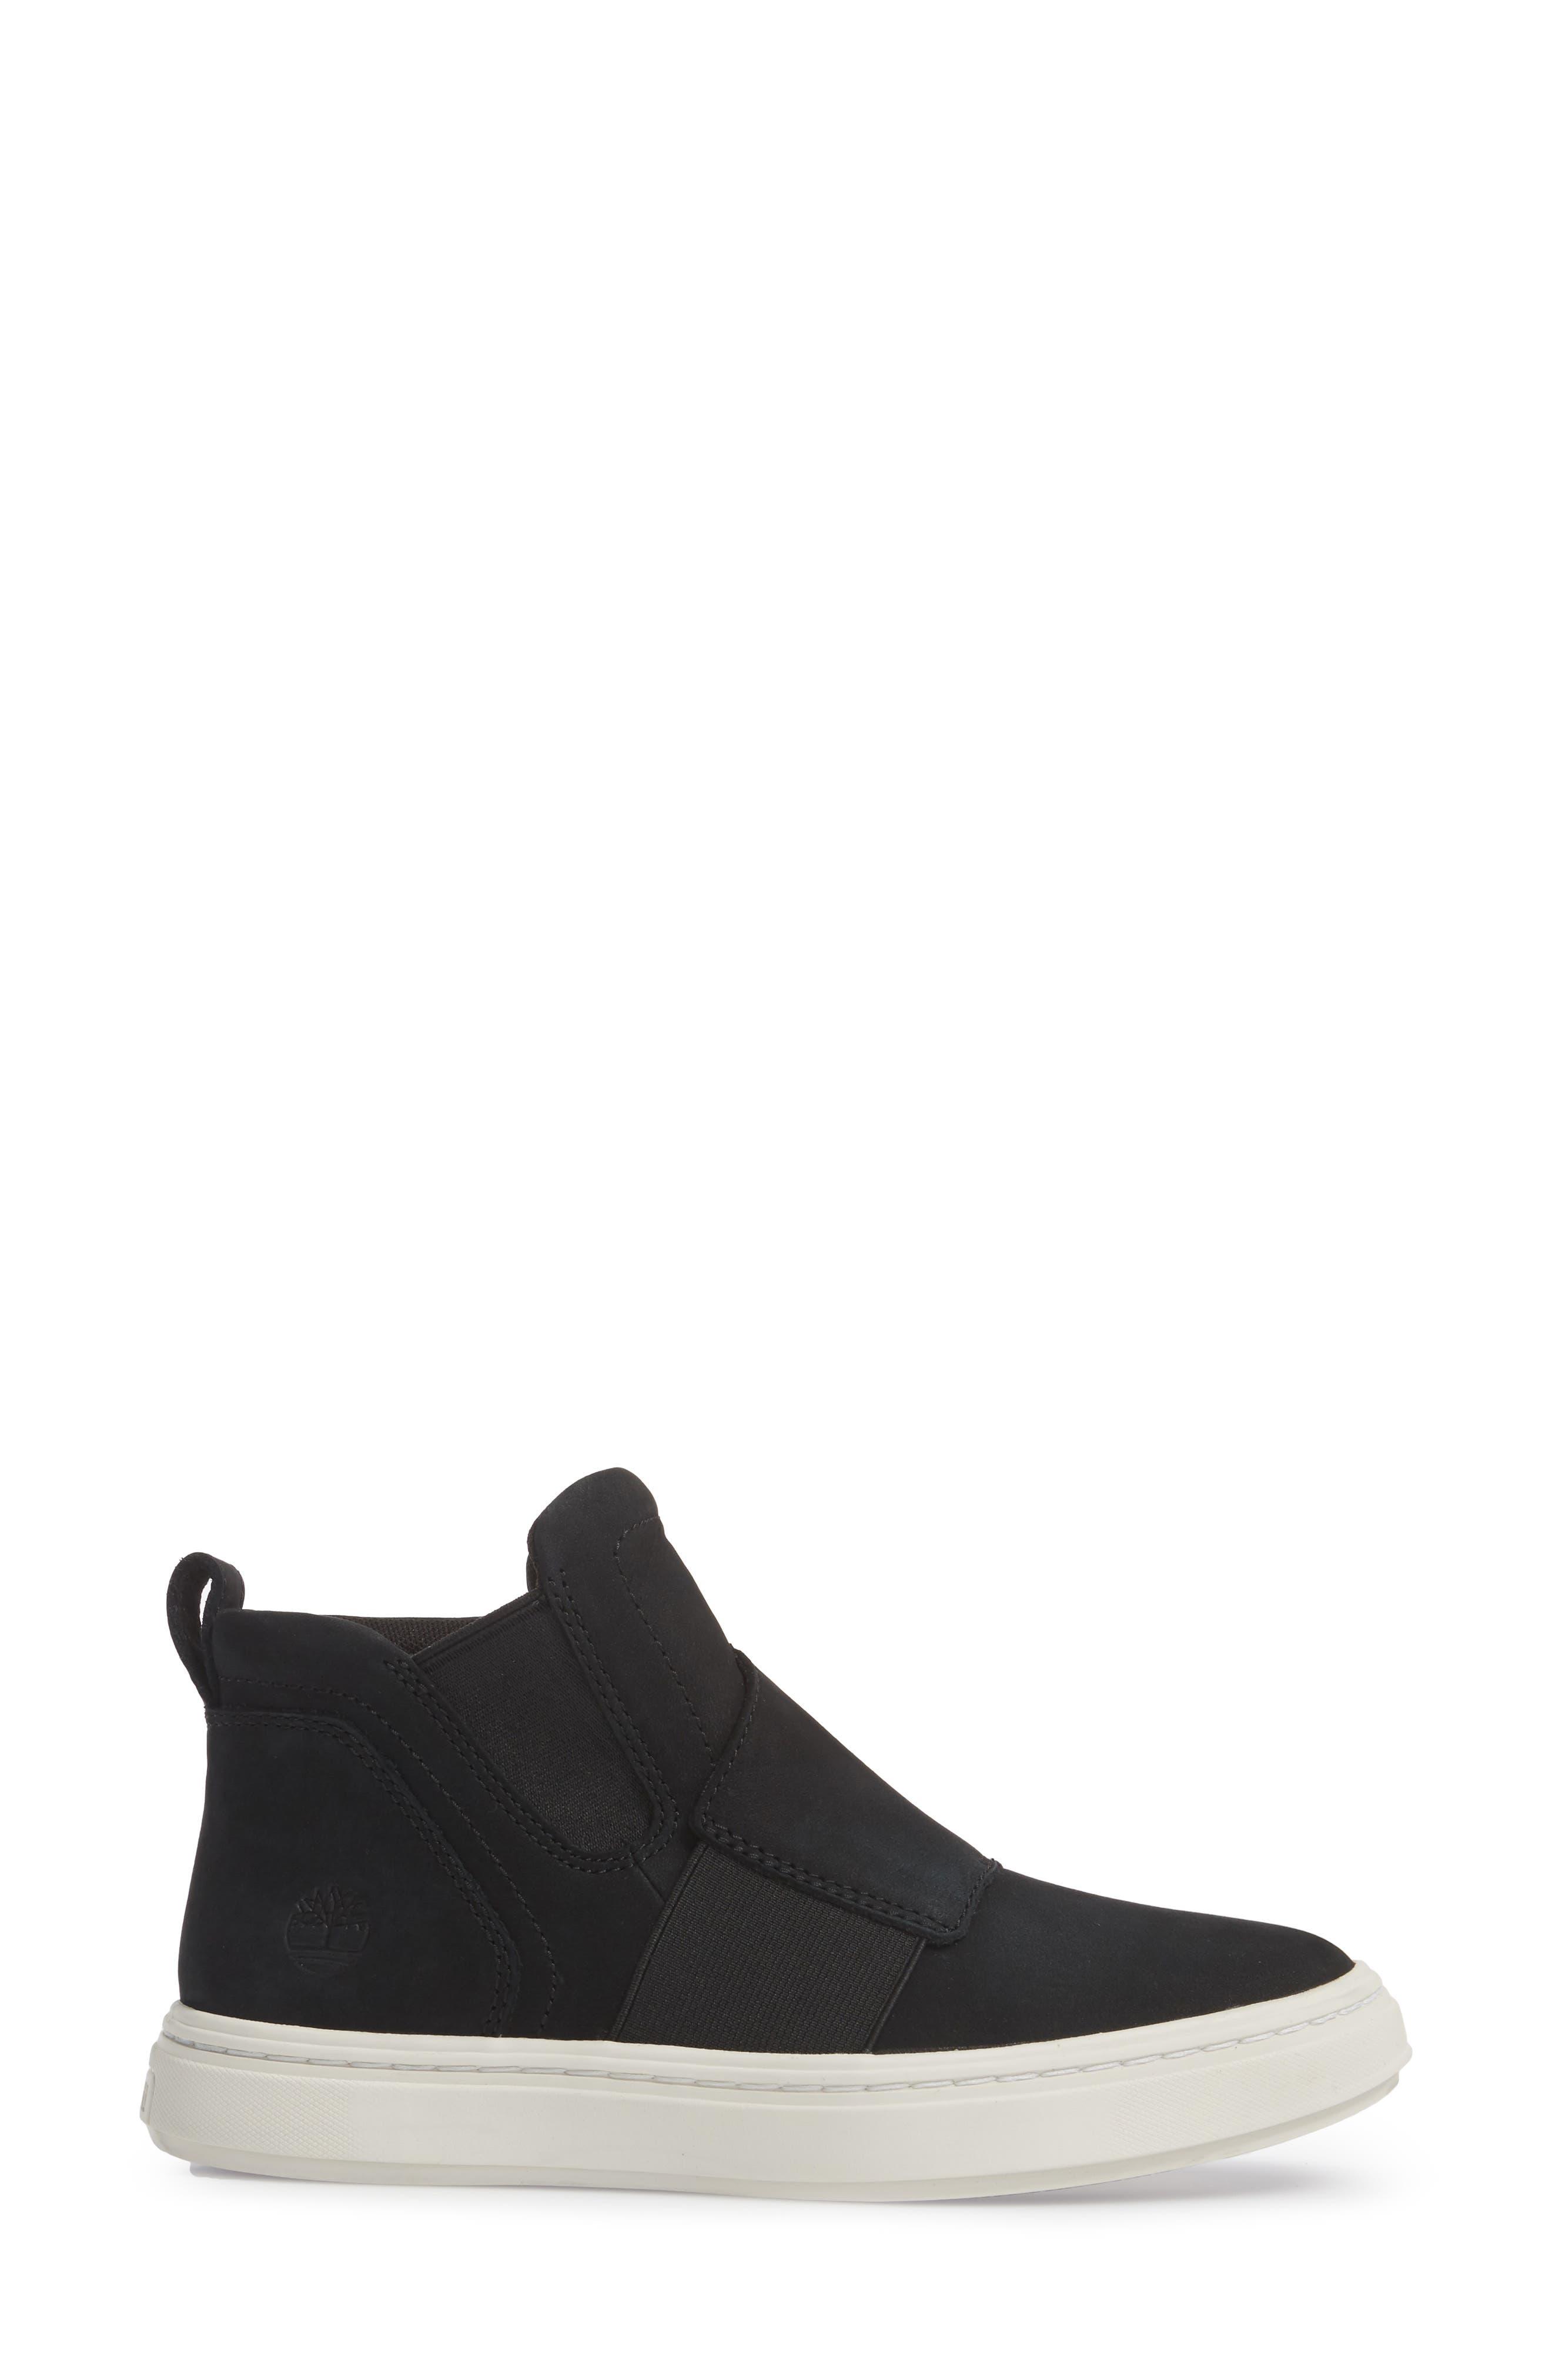 Londyn Chelsea Boot,                             Alternate thumbnail 3, color,                             Black Nubuck Leather